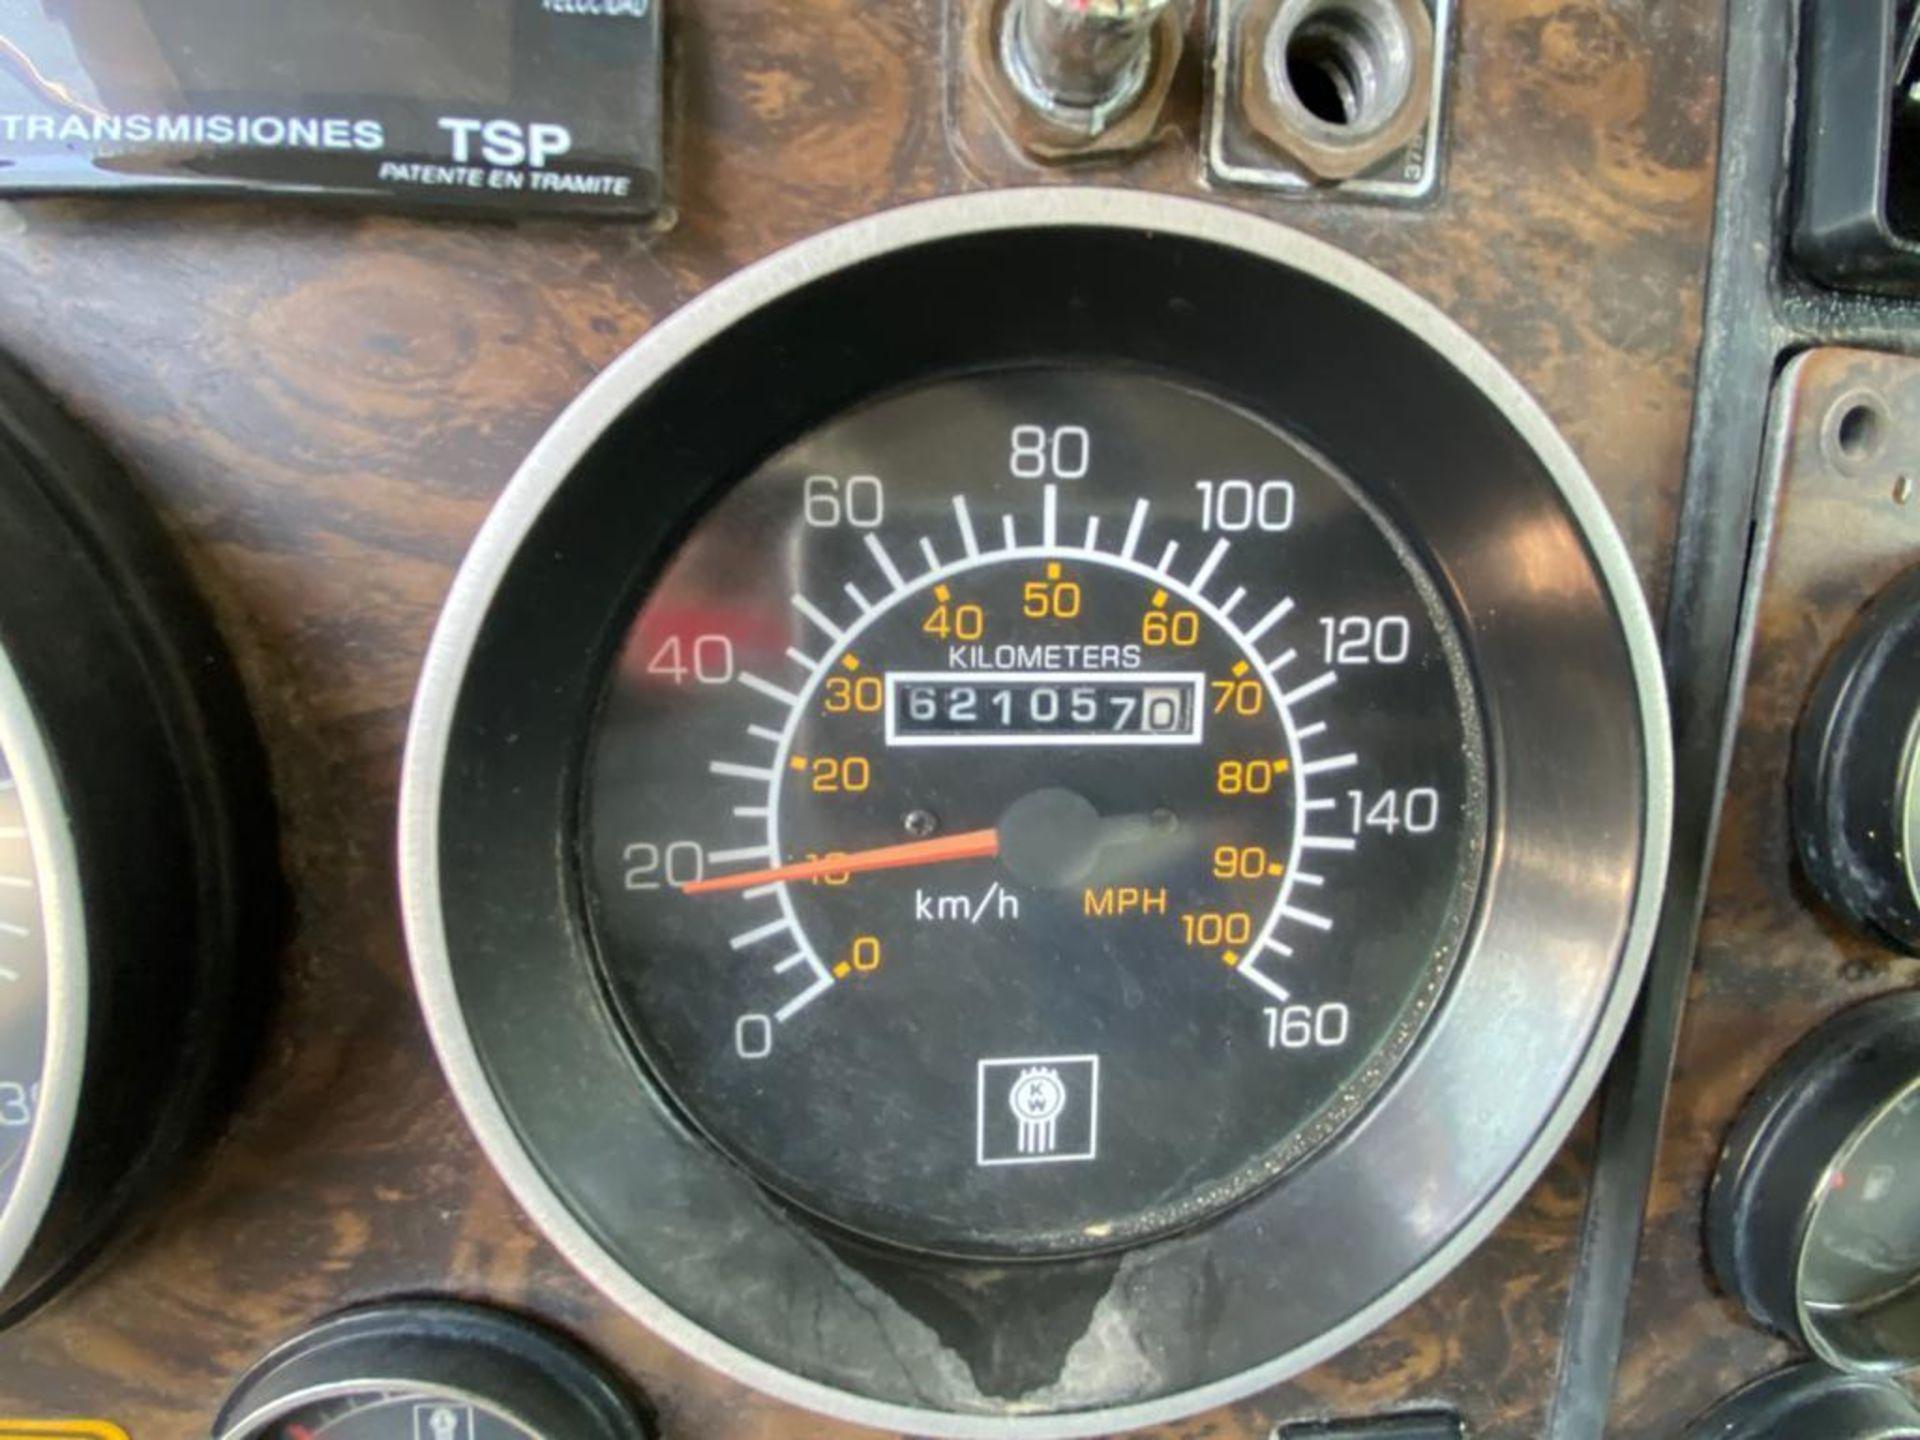 1998 Kenworth 5000 Gallon, standard transmission of 16 speeds - Image 37 of 68